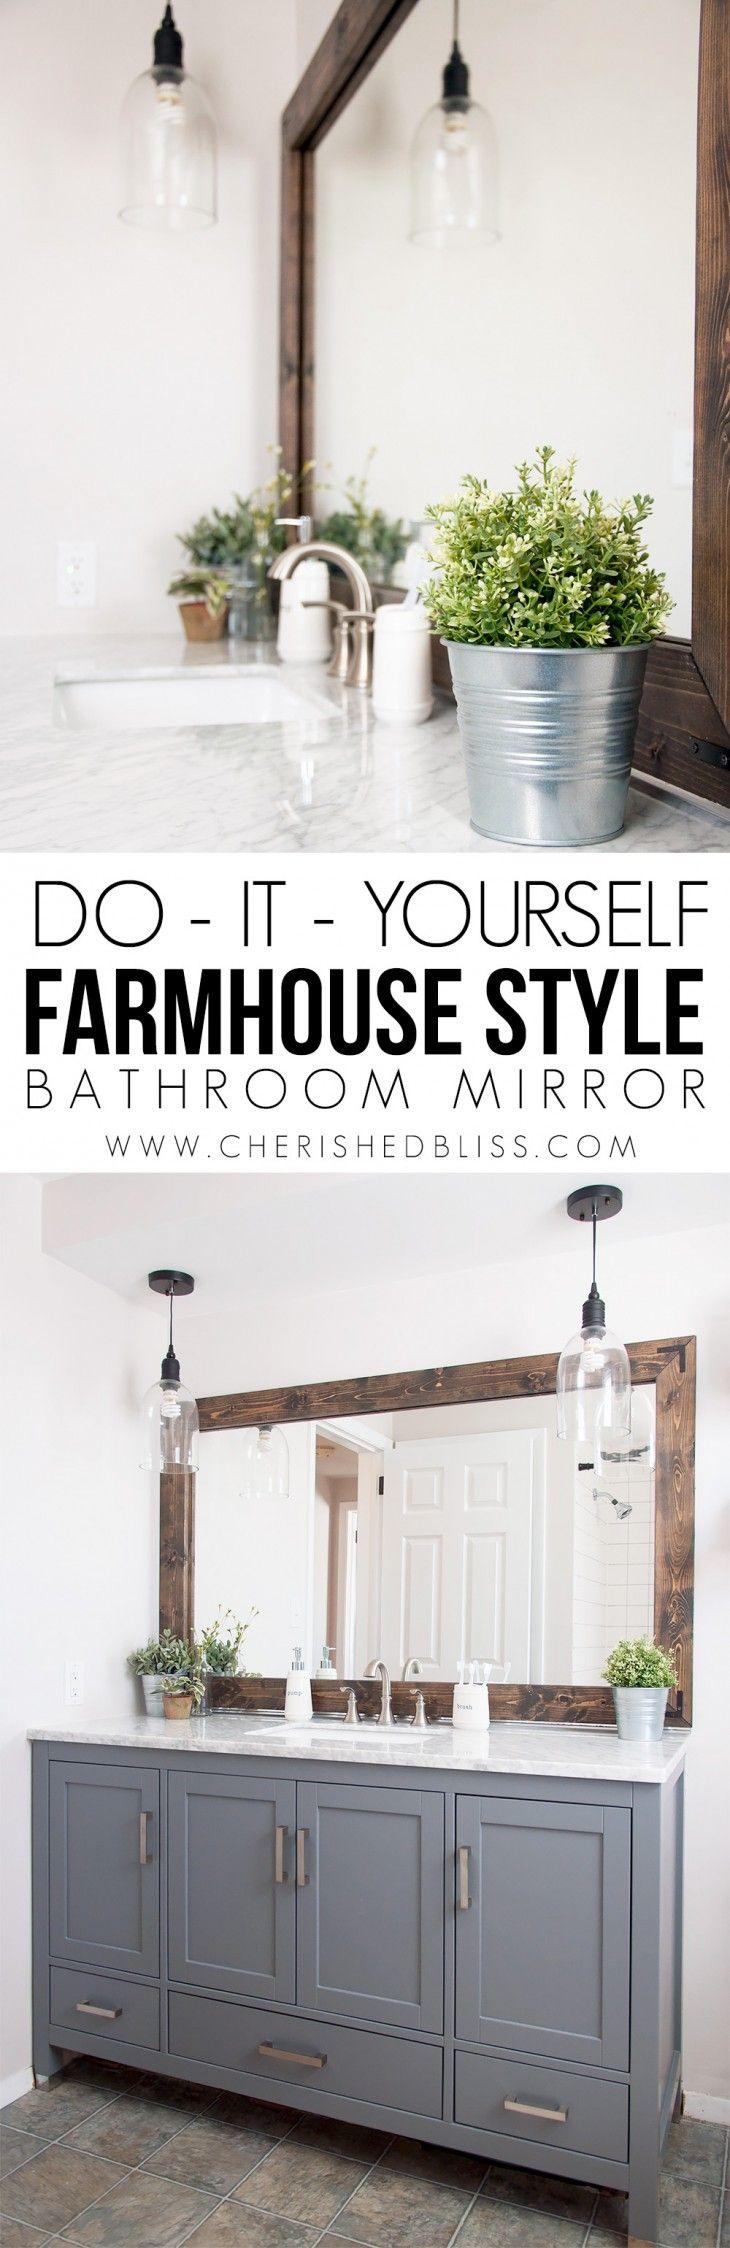 15 Cozy Farmhouse DIY Decor Ideas: 6.Farmhouse Bathroom Mirror ...